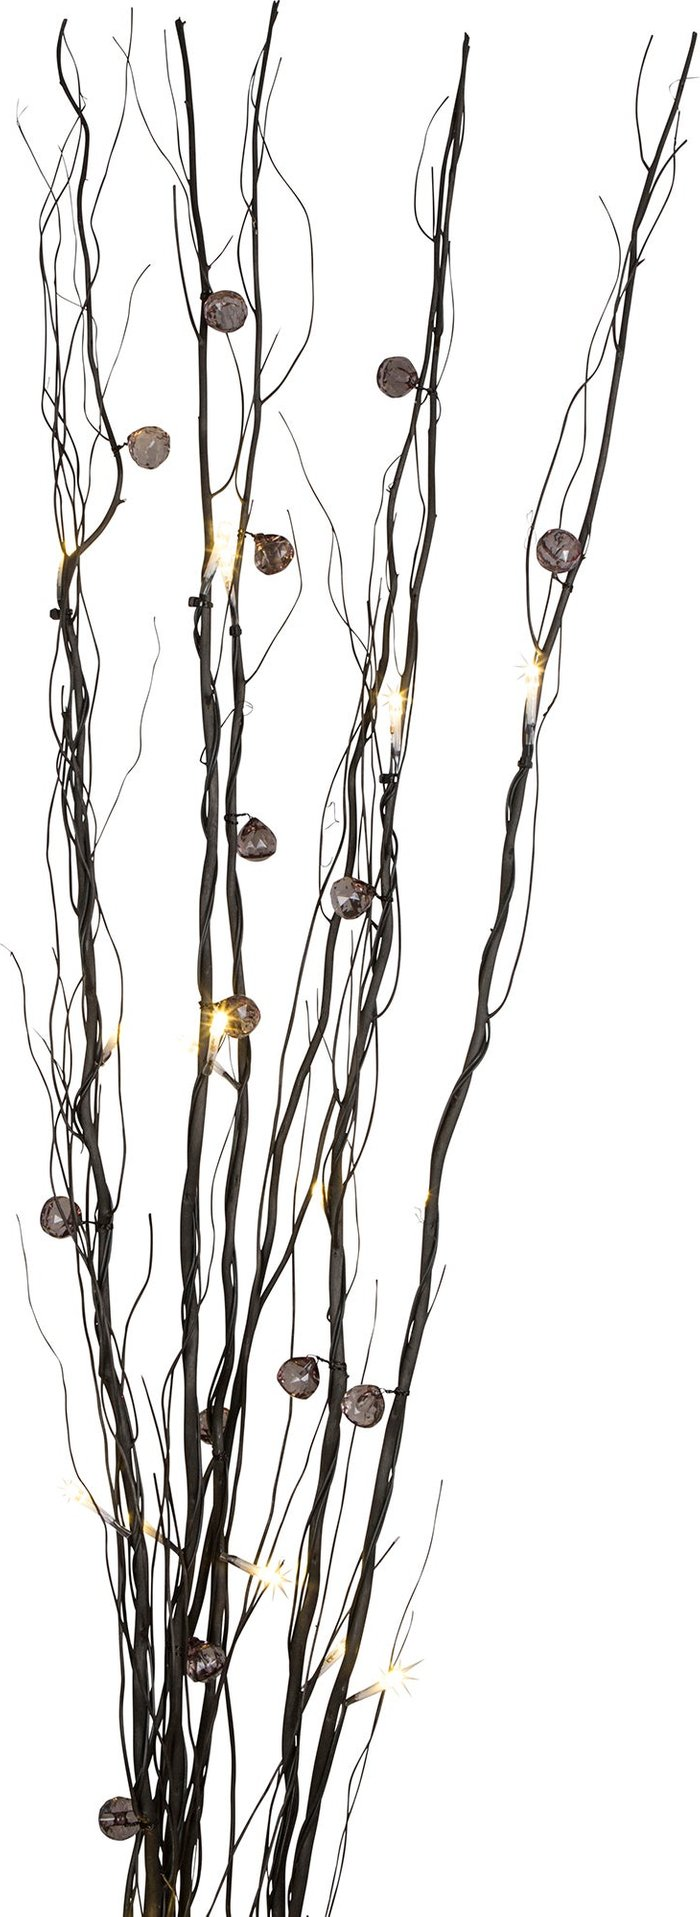 Dunelm Smoke Beads Black Twig Lights Black